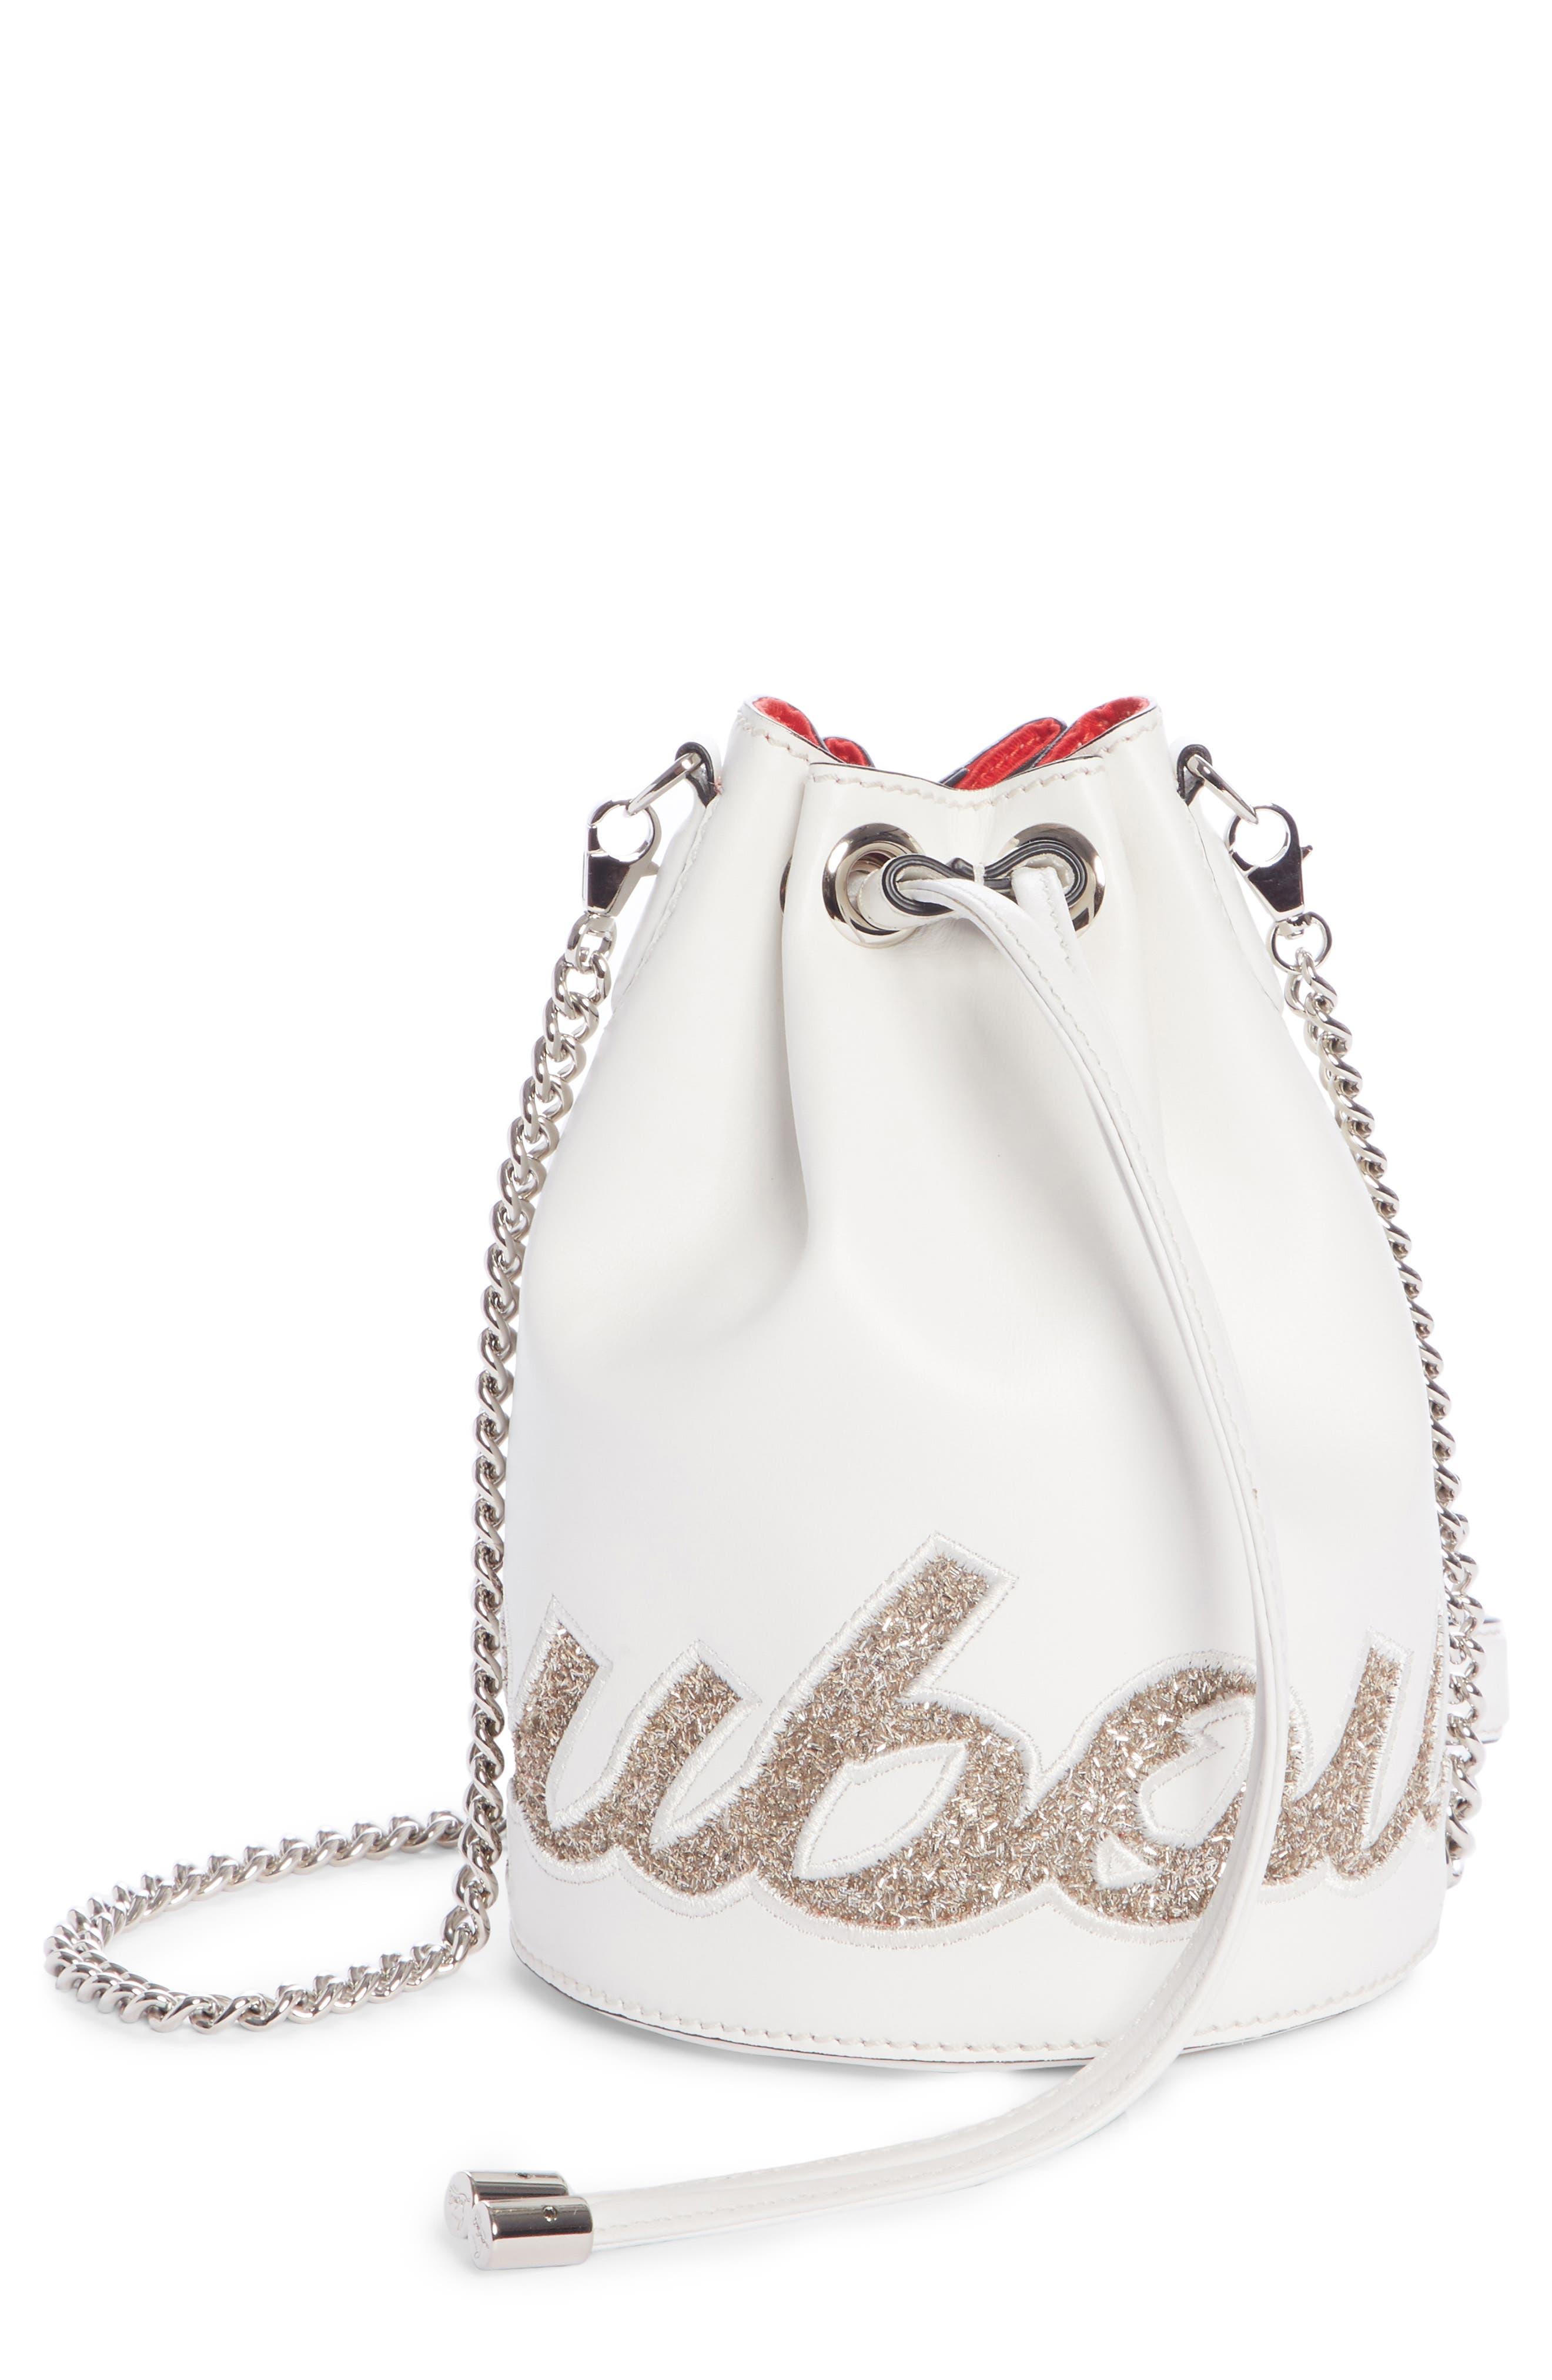 Marie Jane Calfskin Bucket Bag,                         Main,                         color, SNOW/ PERLE